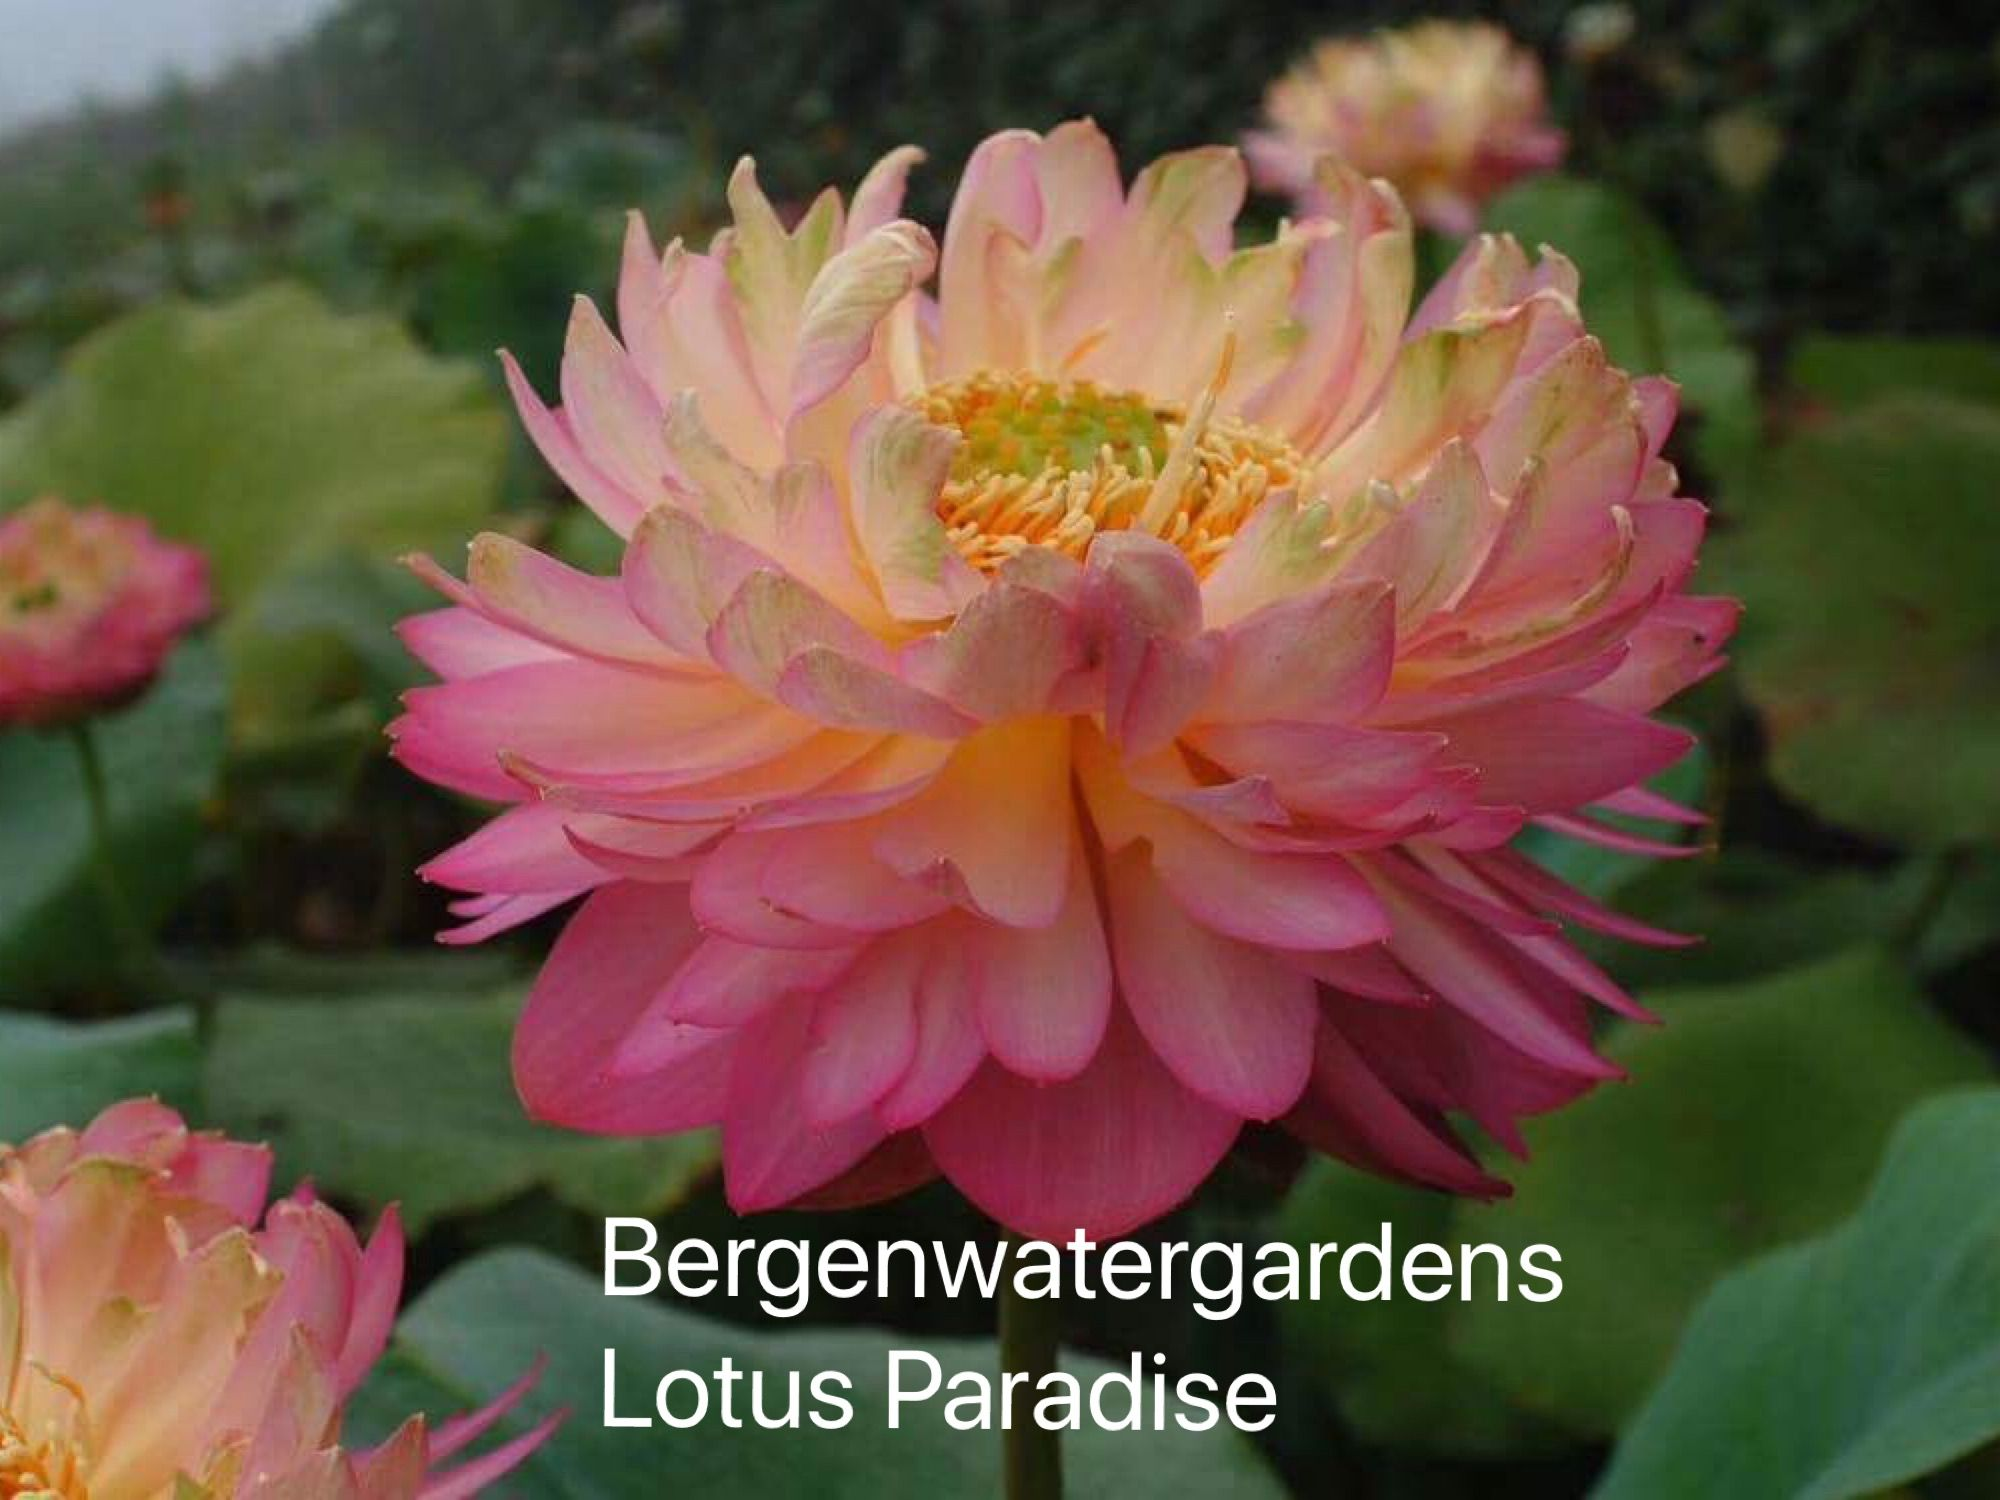 Pin by lotus paradise on lotus paradise pinterest lotus paradise chinese lotus flower tomatoes lotus flowers heaven heavens izmirmasajfo